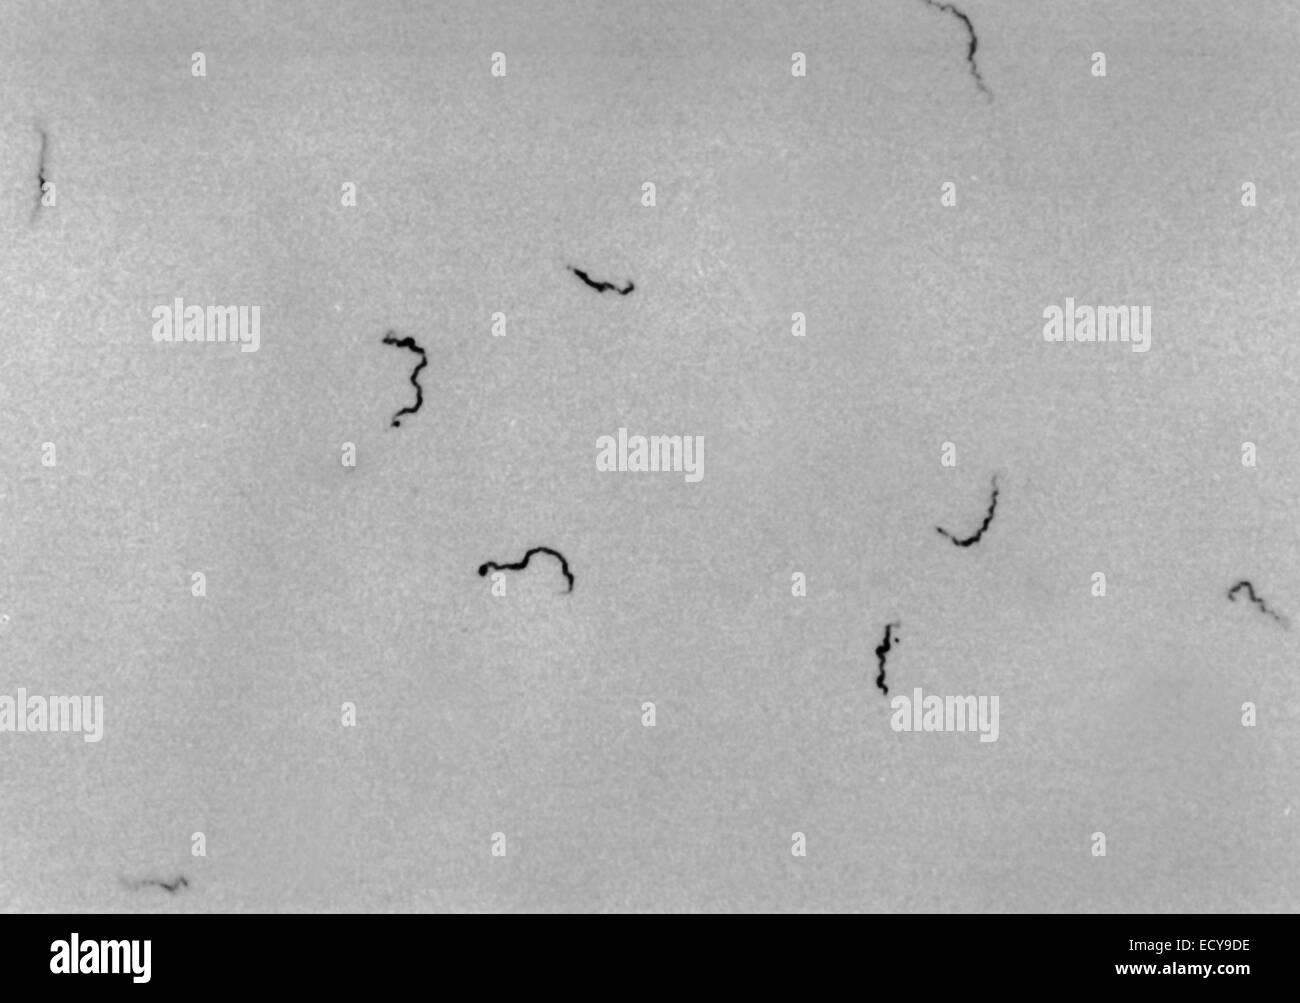 Treponema pallidum shown under dark field light microscopy. - Stock Image